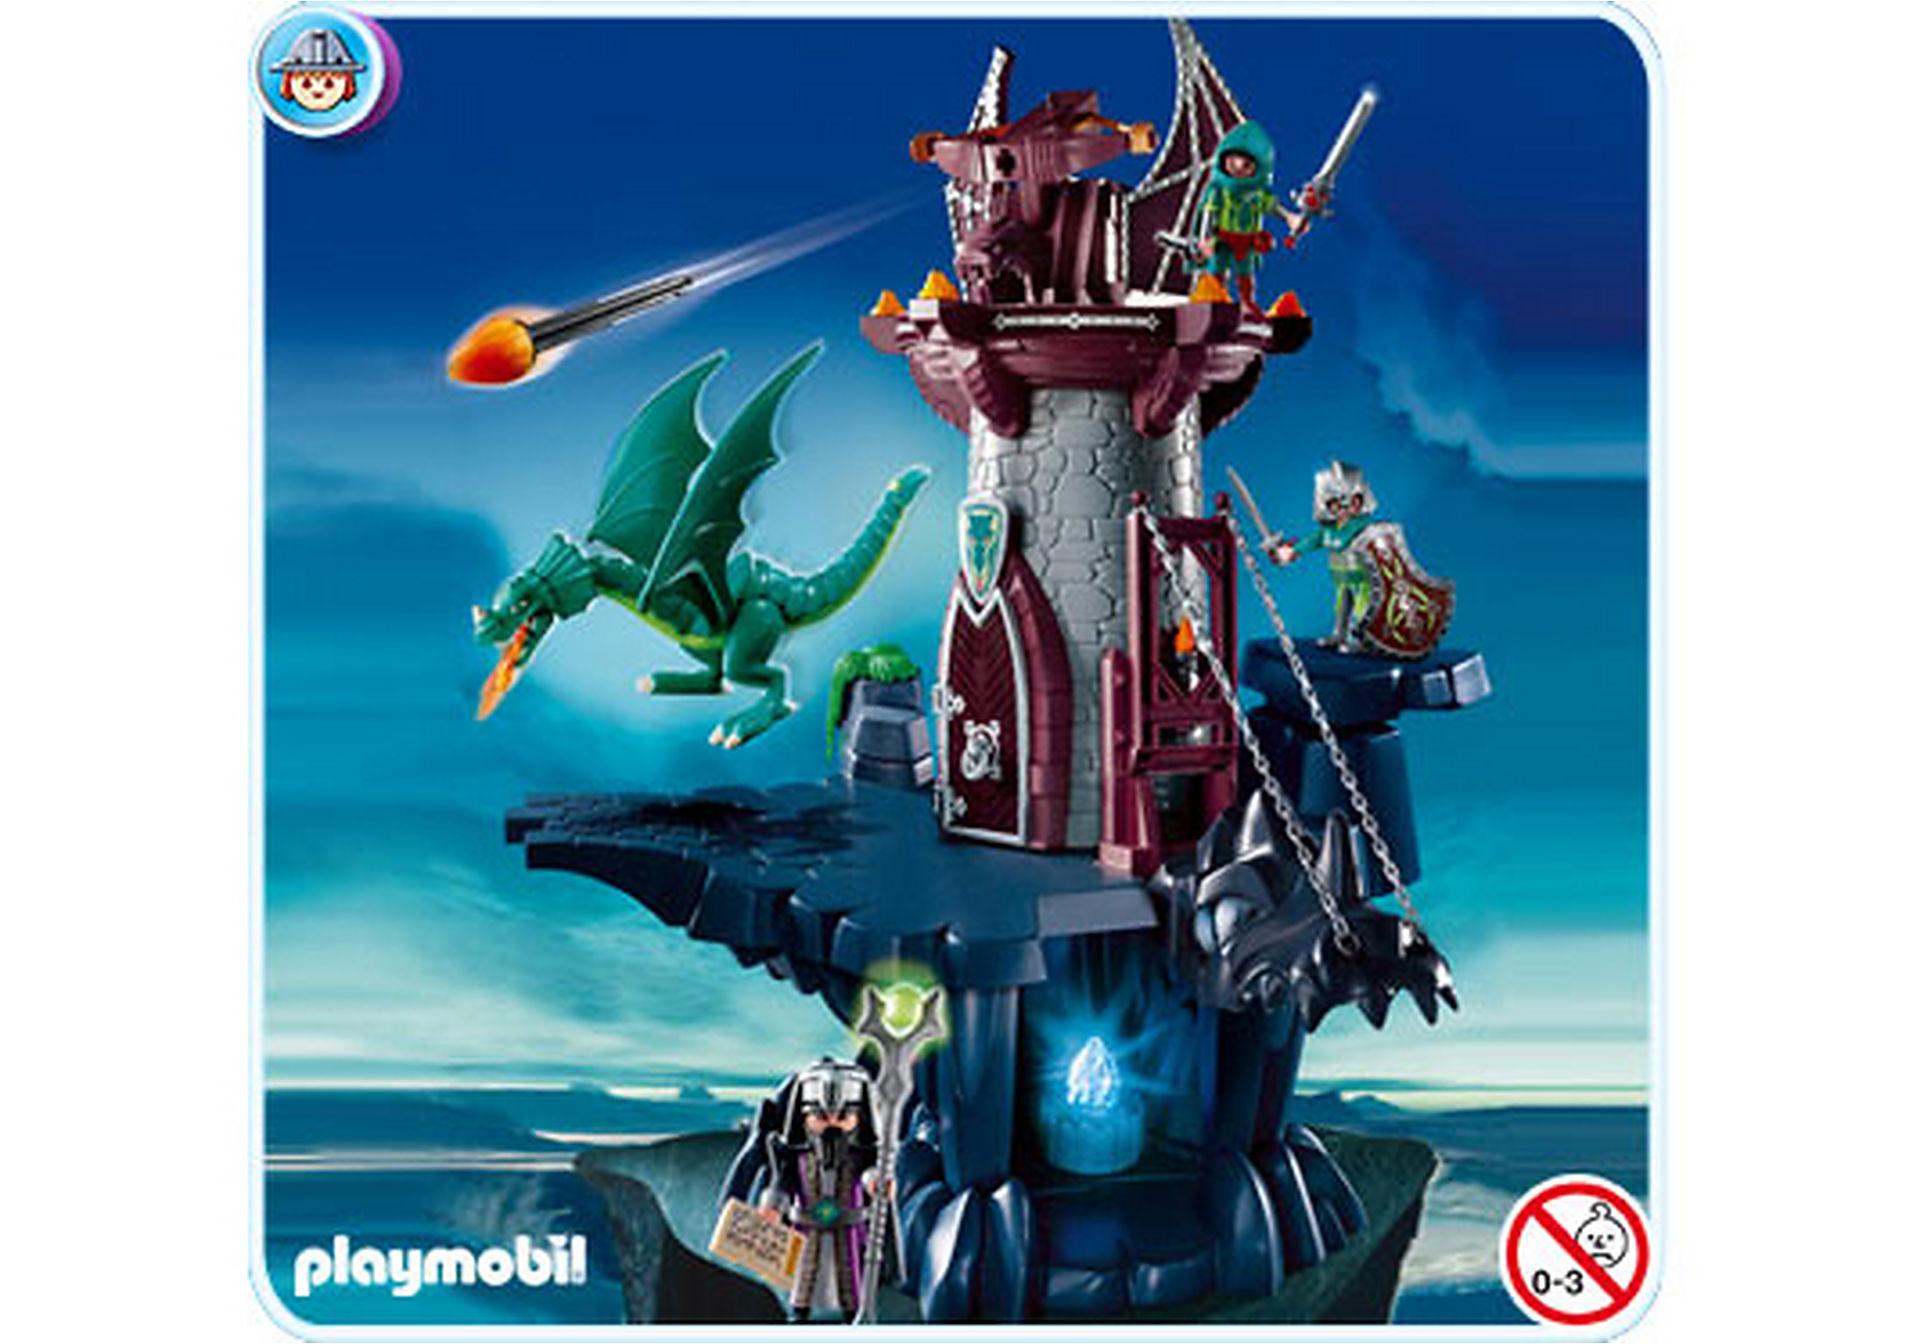 http://media.playmobil.com/i/playmobil/4836-A_product_detail/Drachenturm